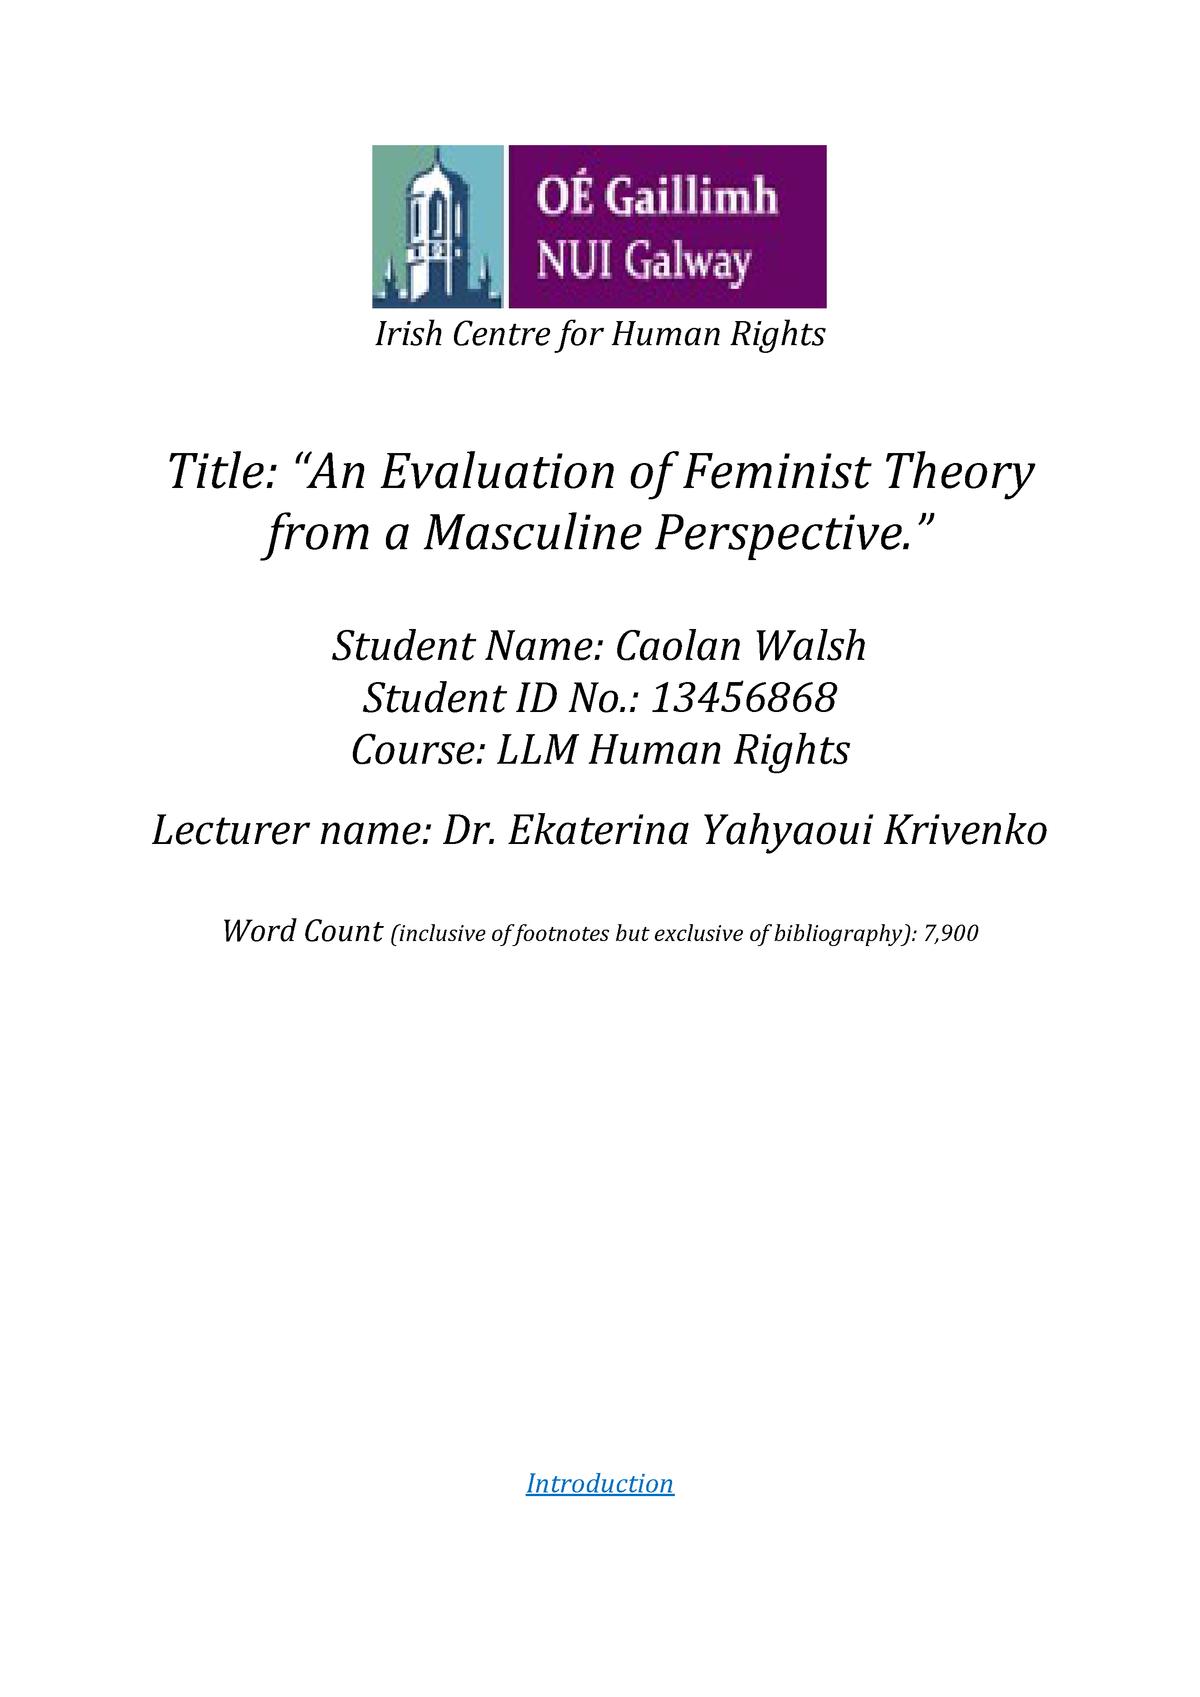 The retreat from organization: U.S. feminism reconceptualized